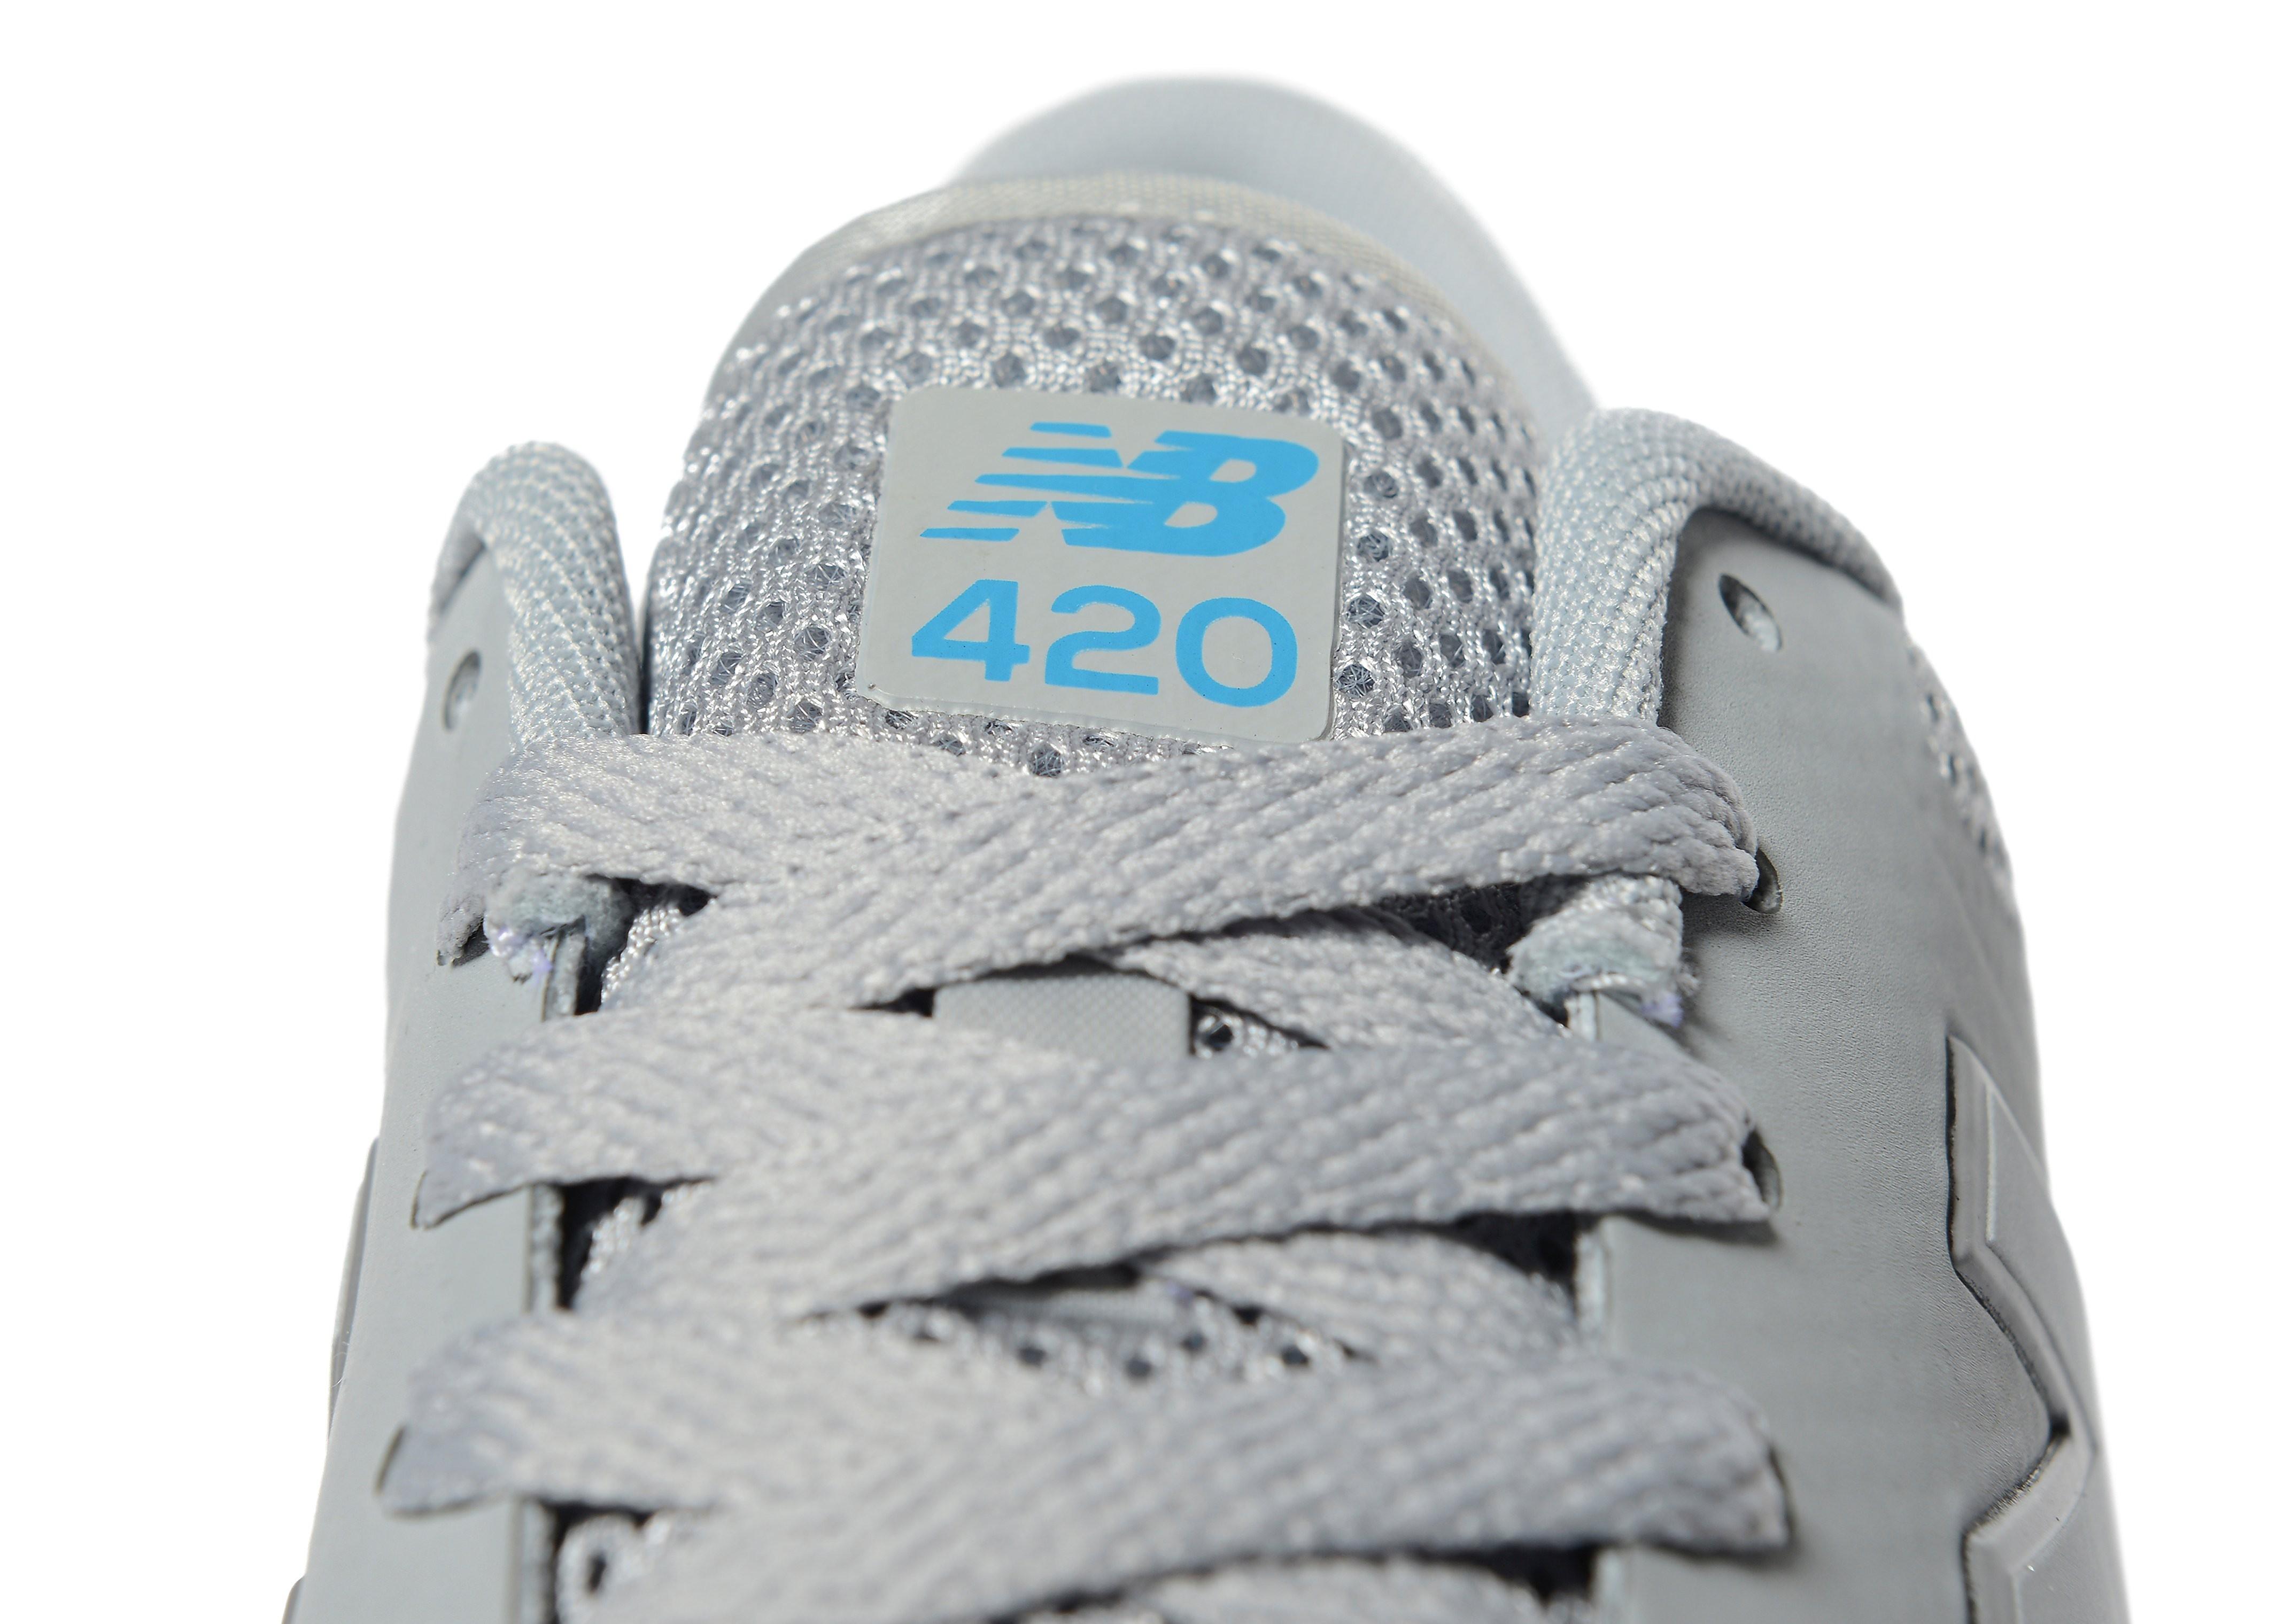 New Balance 420 Reflective Re-Engineered